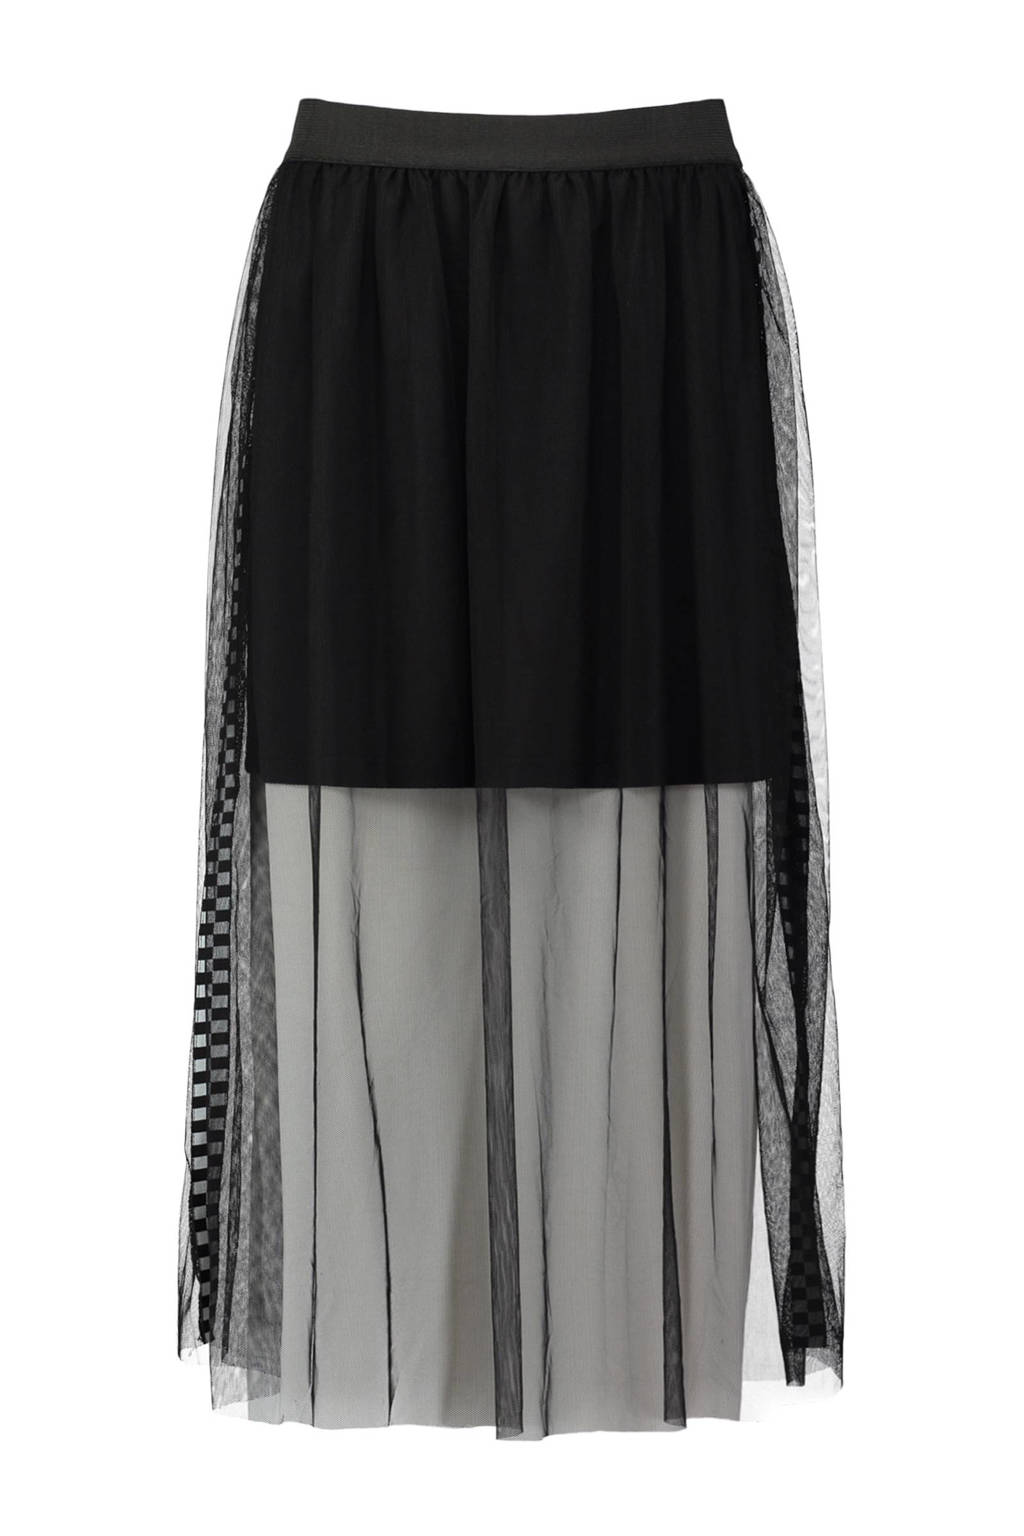 691e69c30dd5fa CoolCat plissé rok met tule zwart